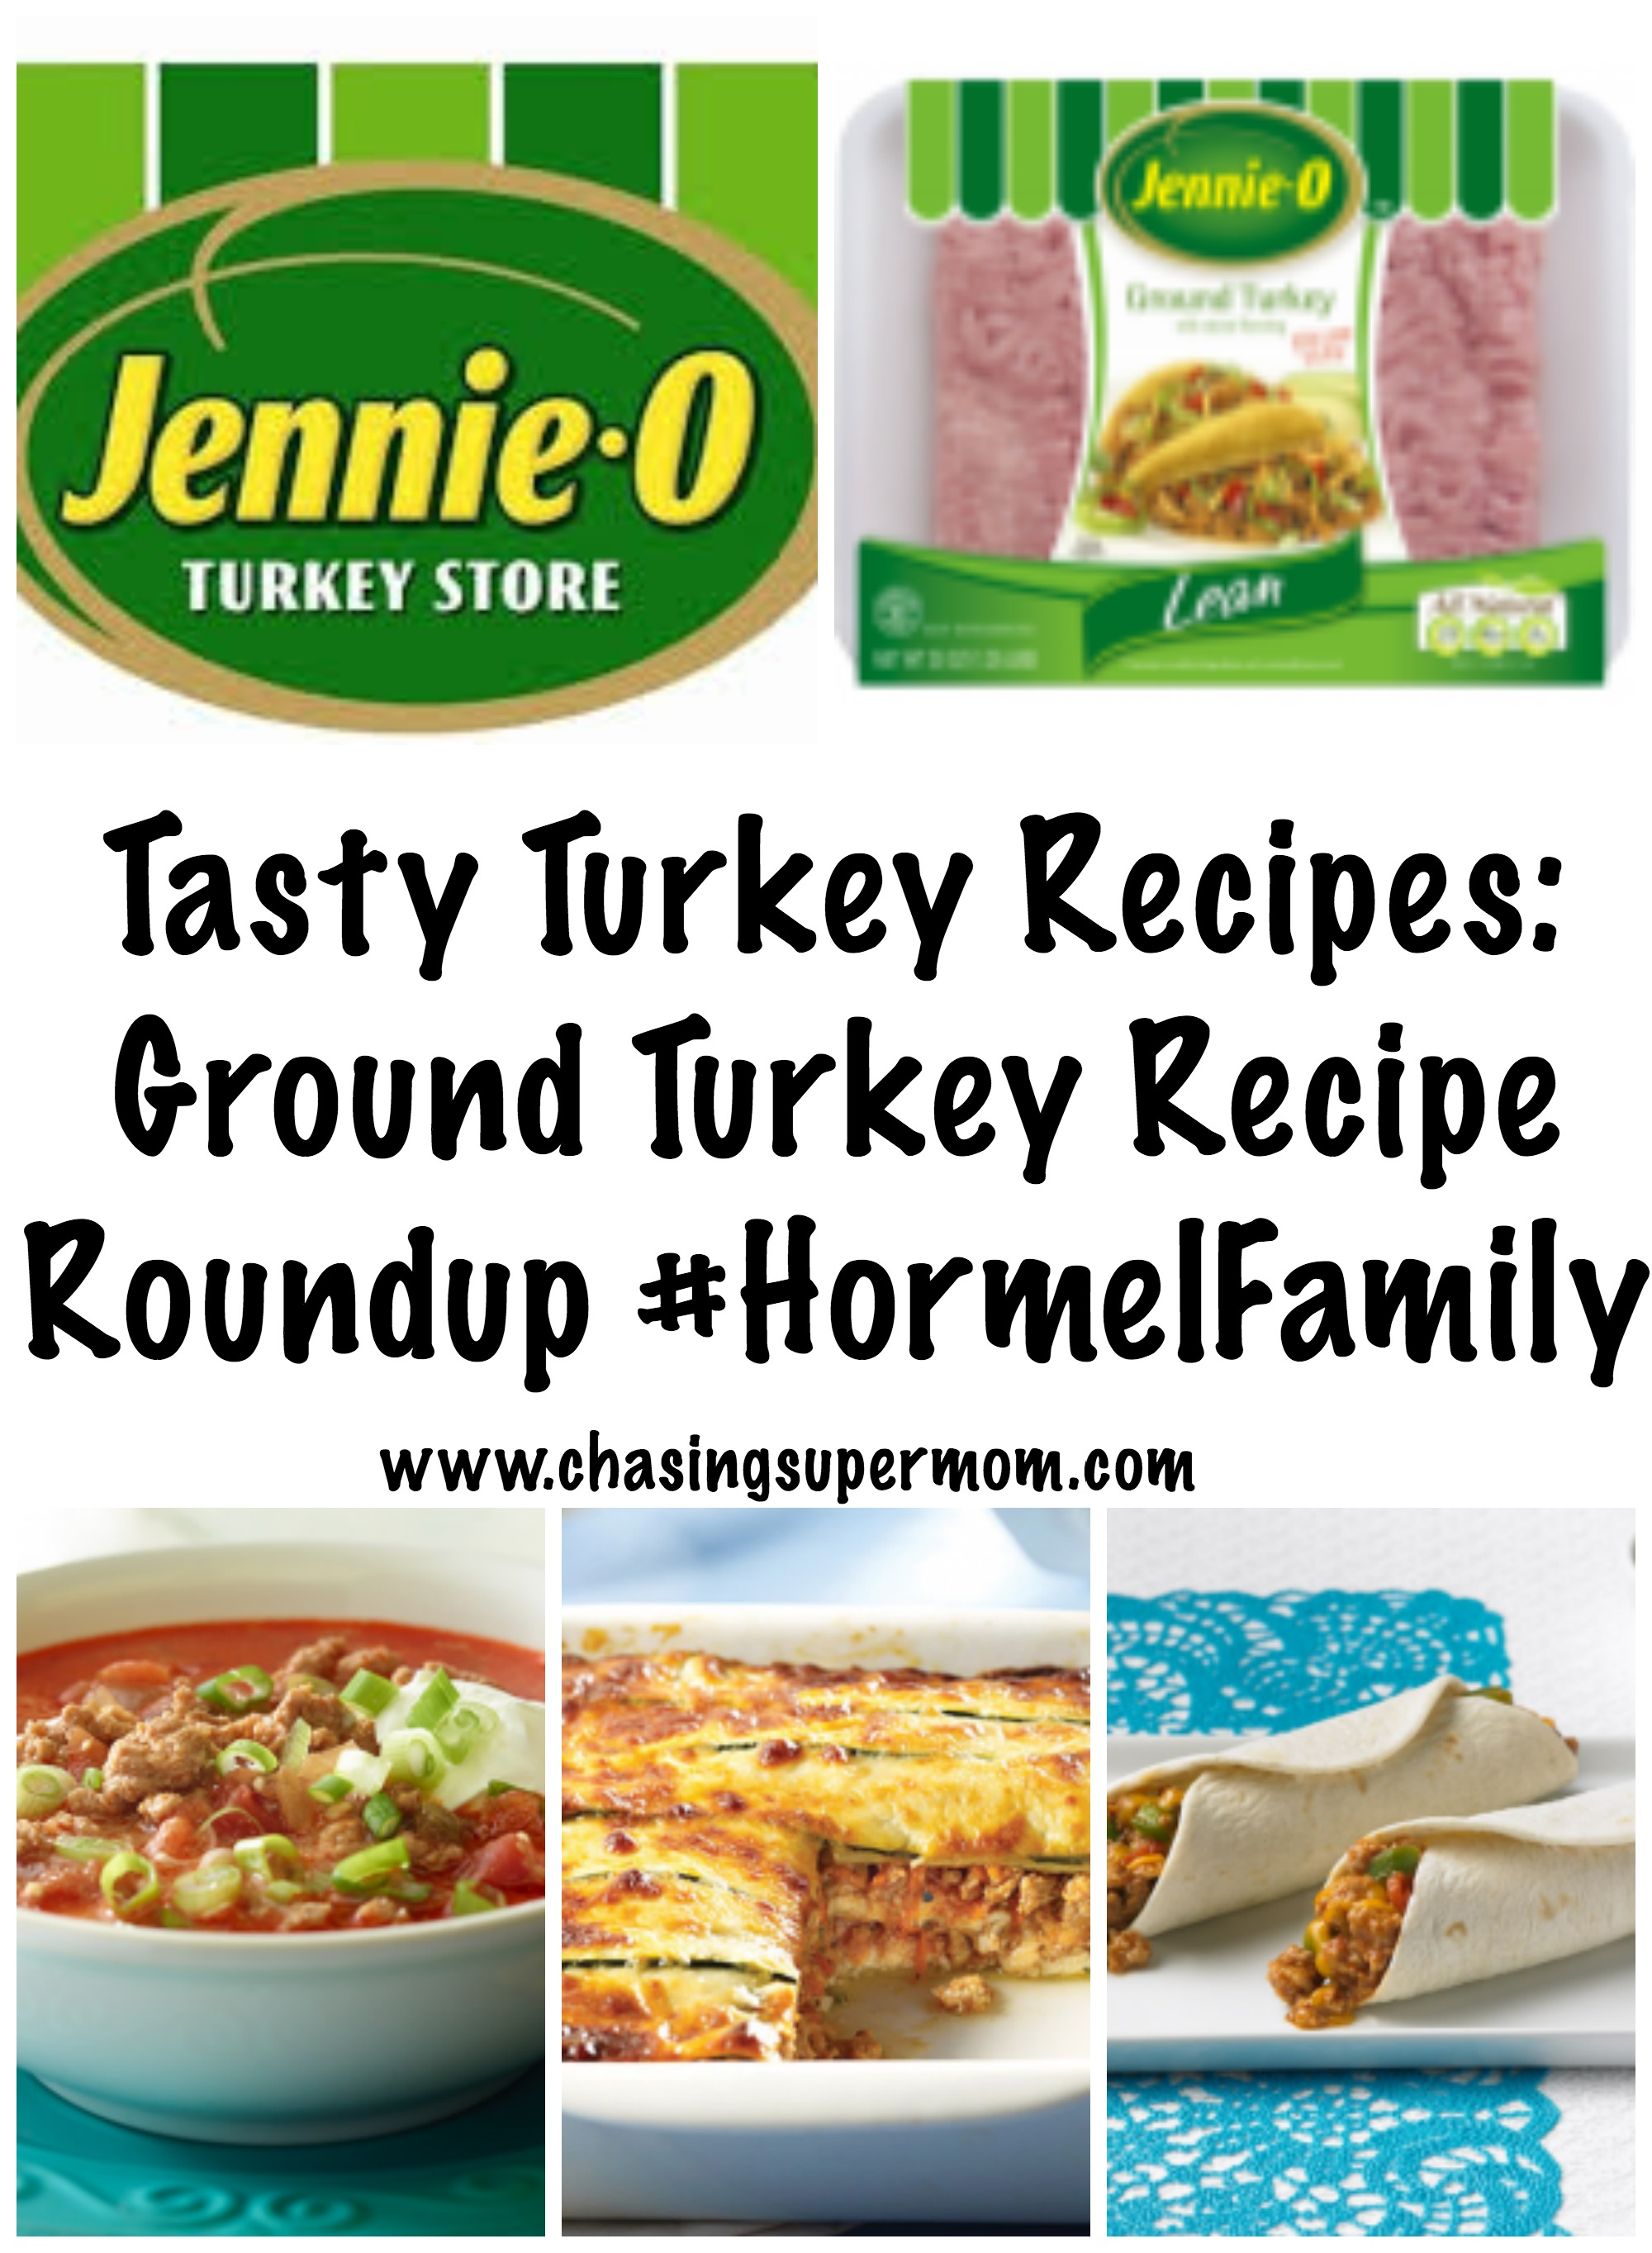 Tasty Turkey Recipes: Ground Turkey Recipe Roundup #HormelFamily